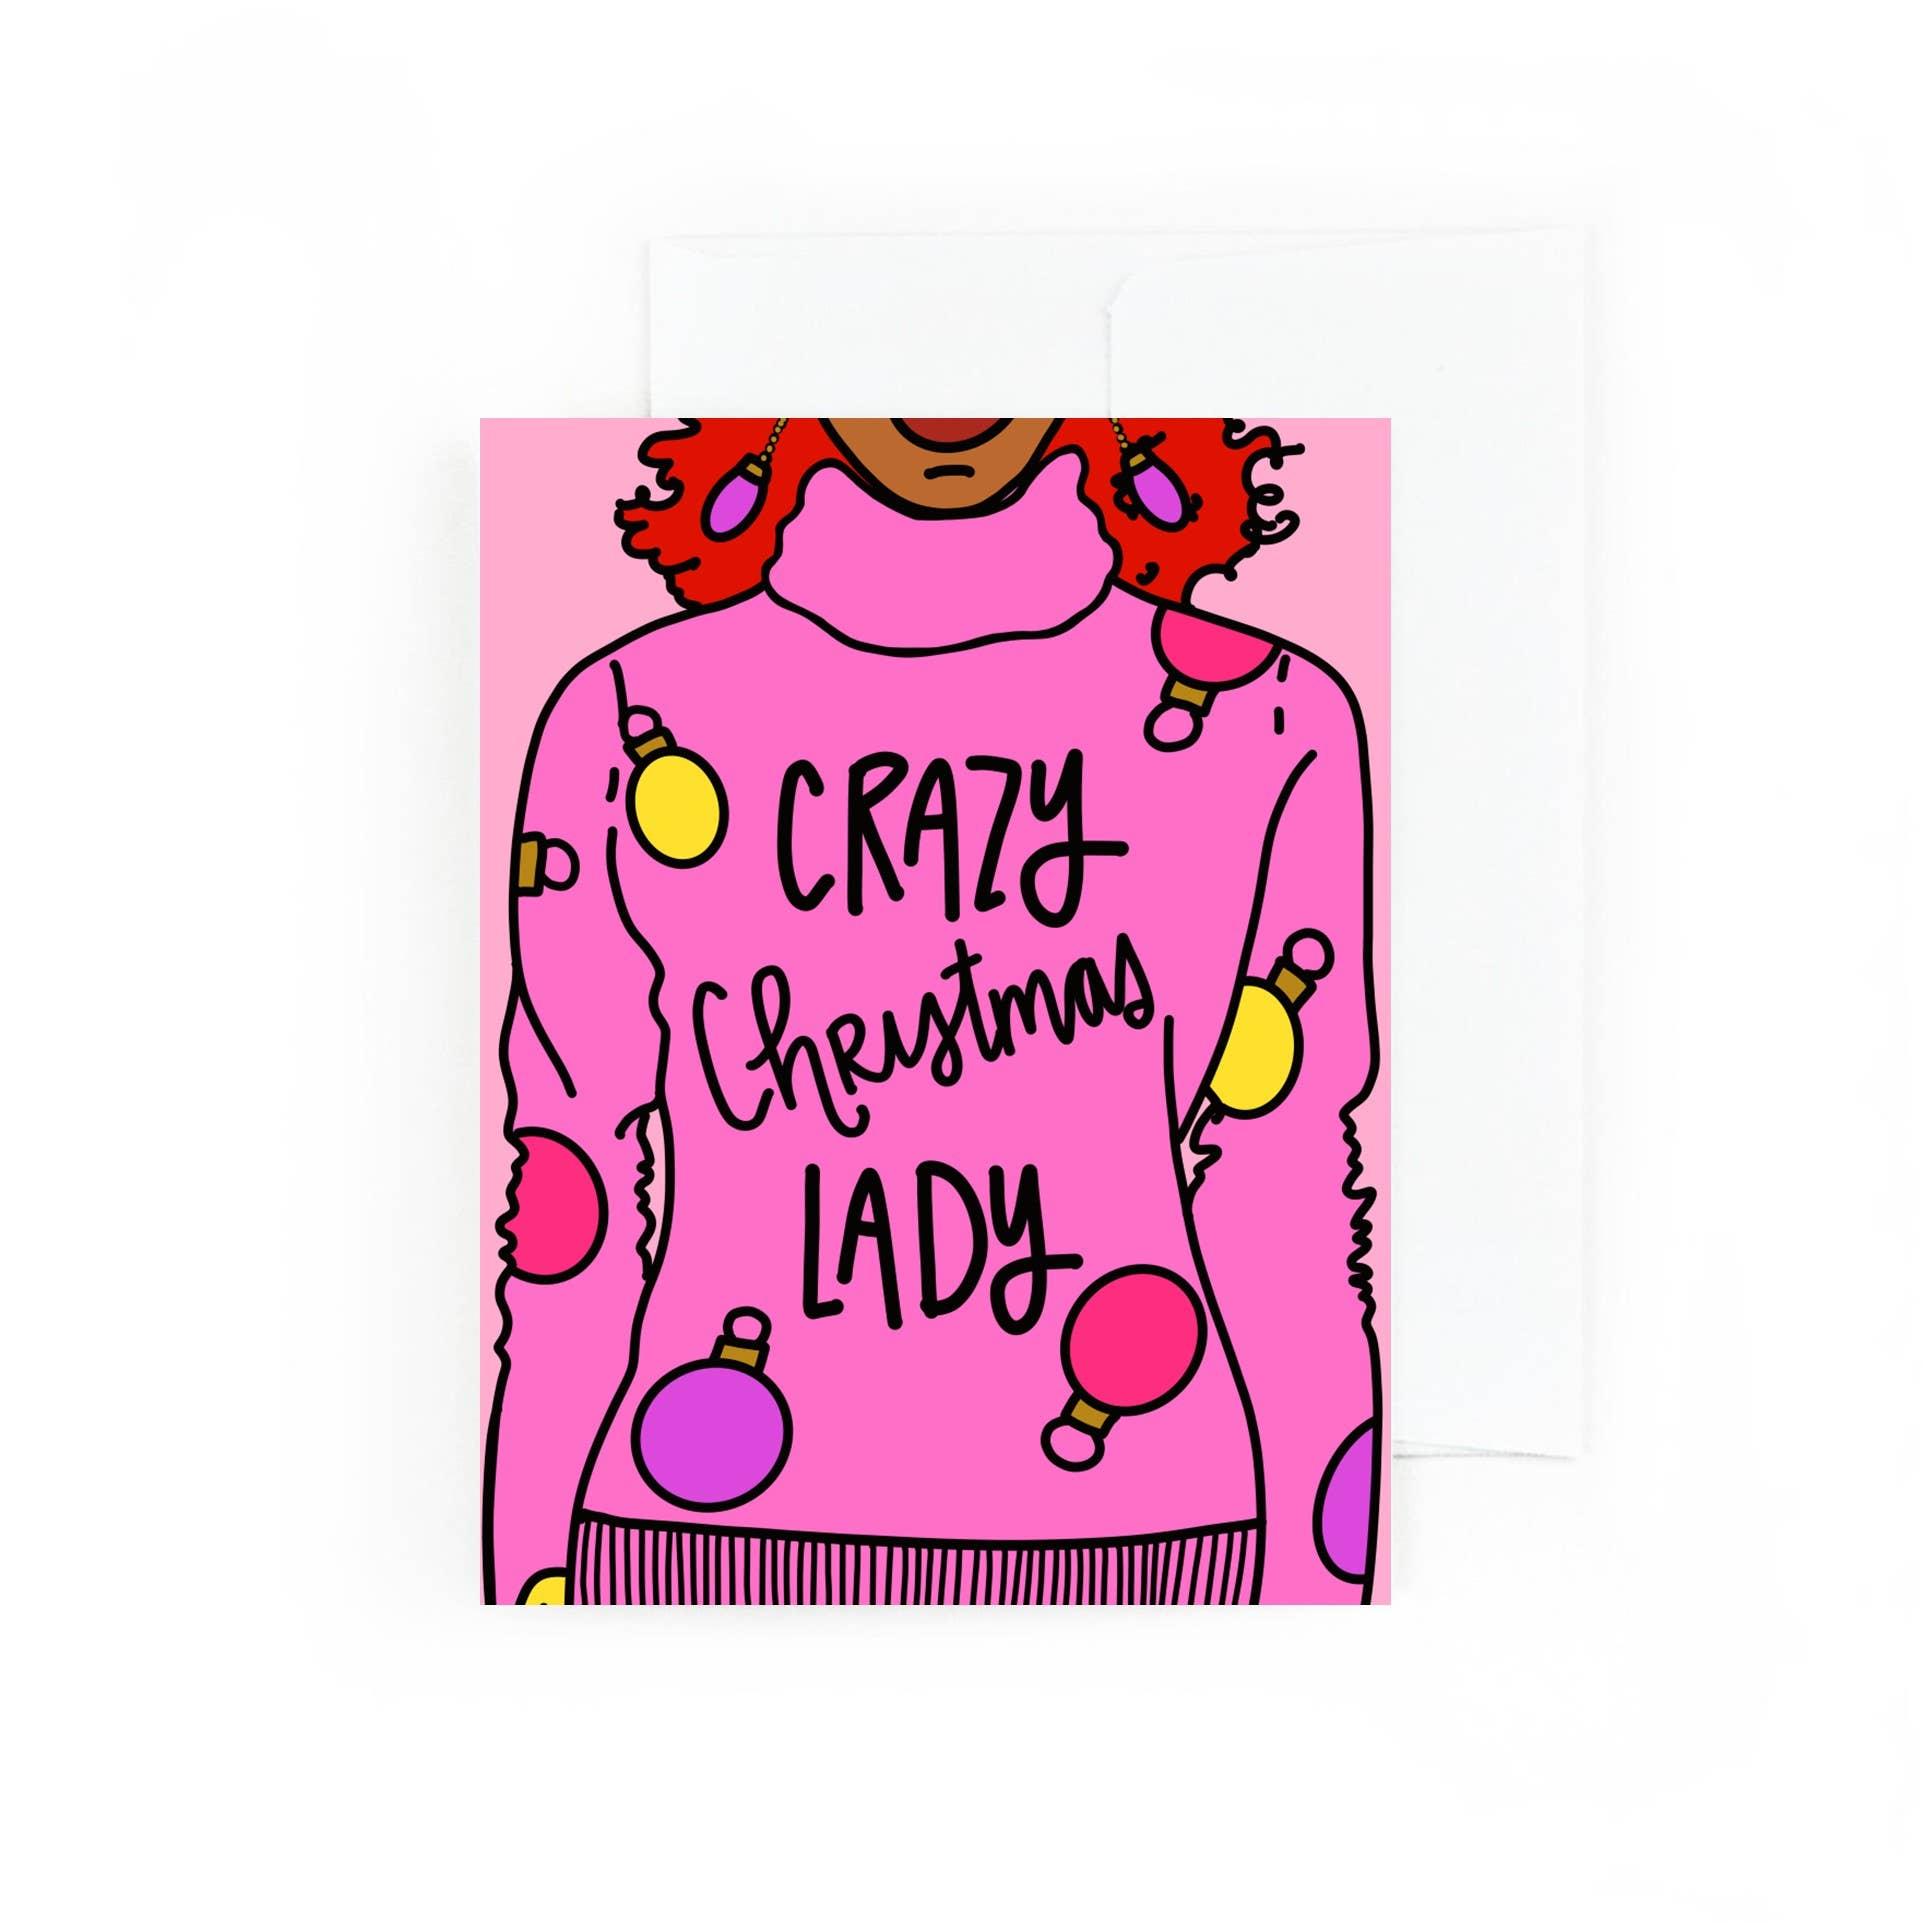 Crazy Christmas Lady , Holiday Greeting Card | Trada Marketplace